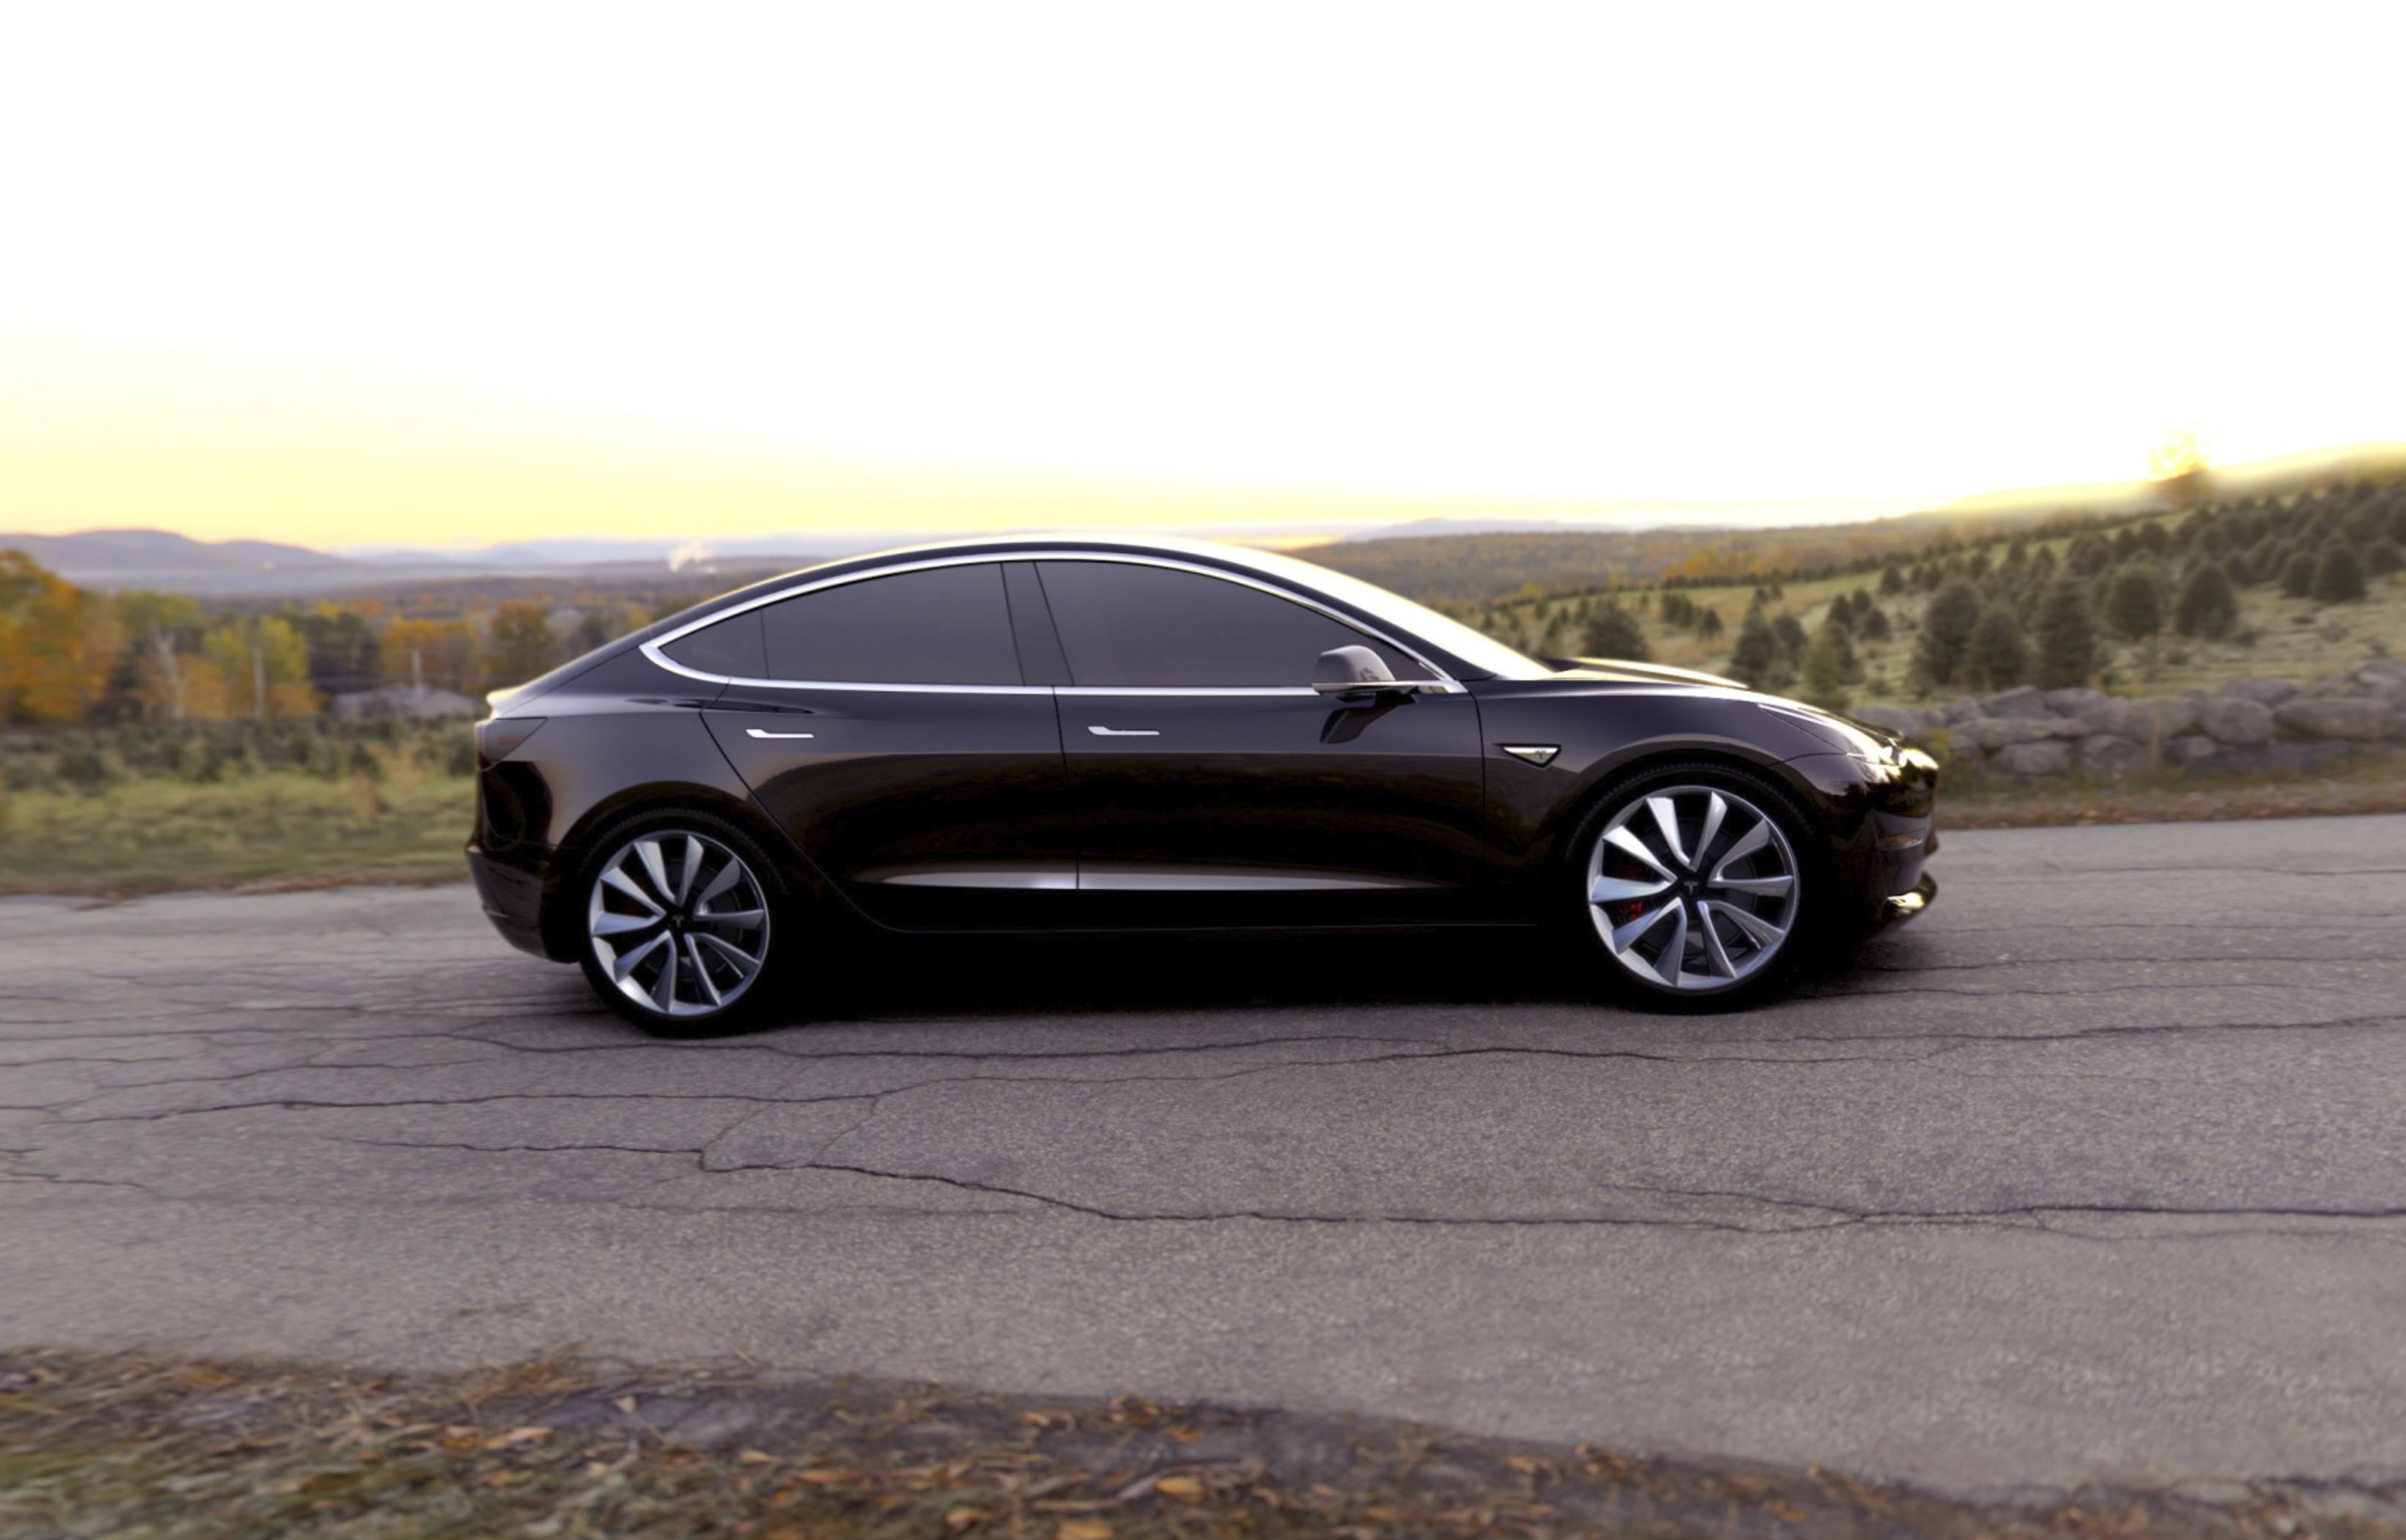 Tesla's Model 3 being tested on roadways.